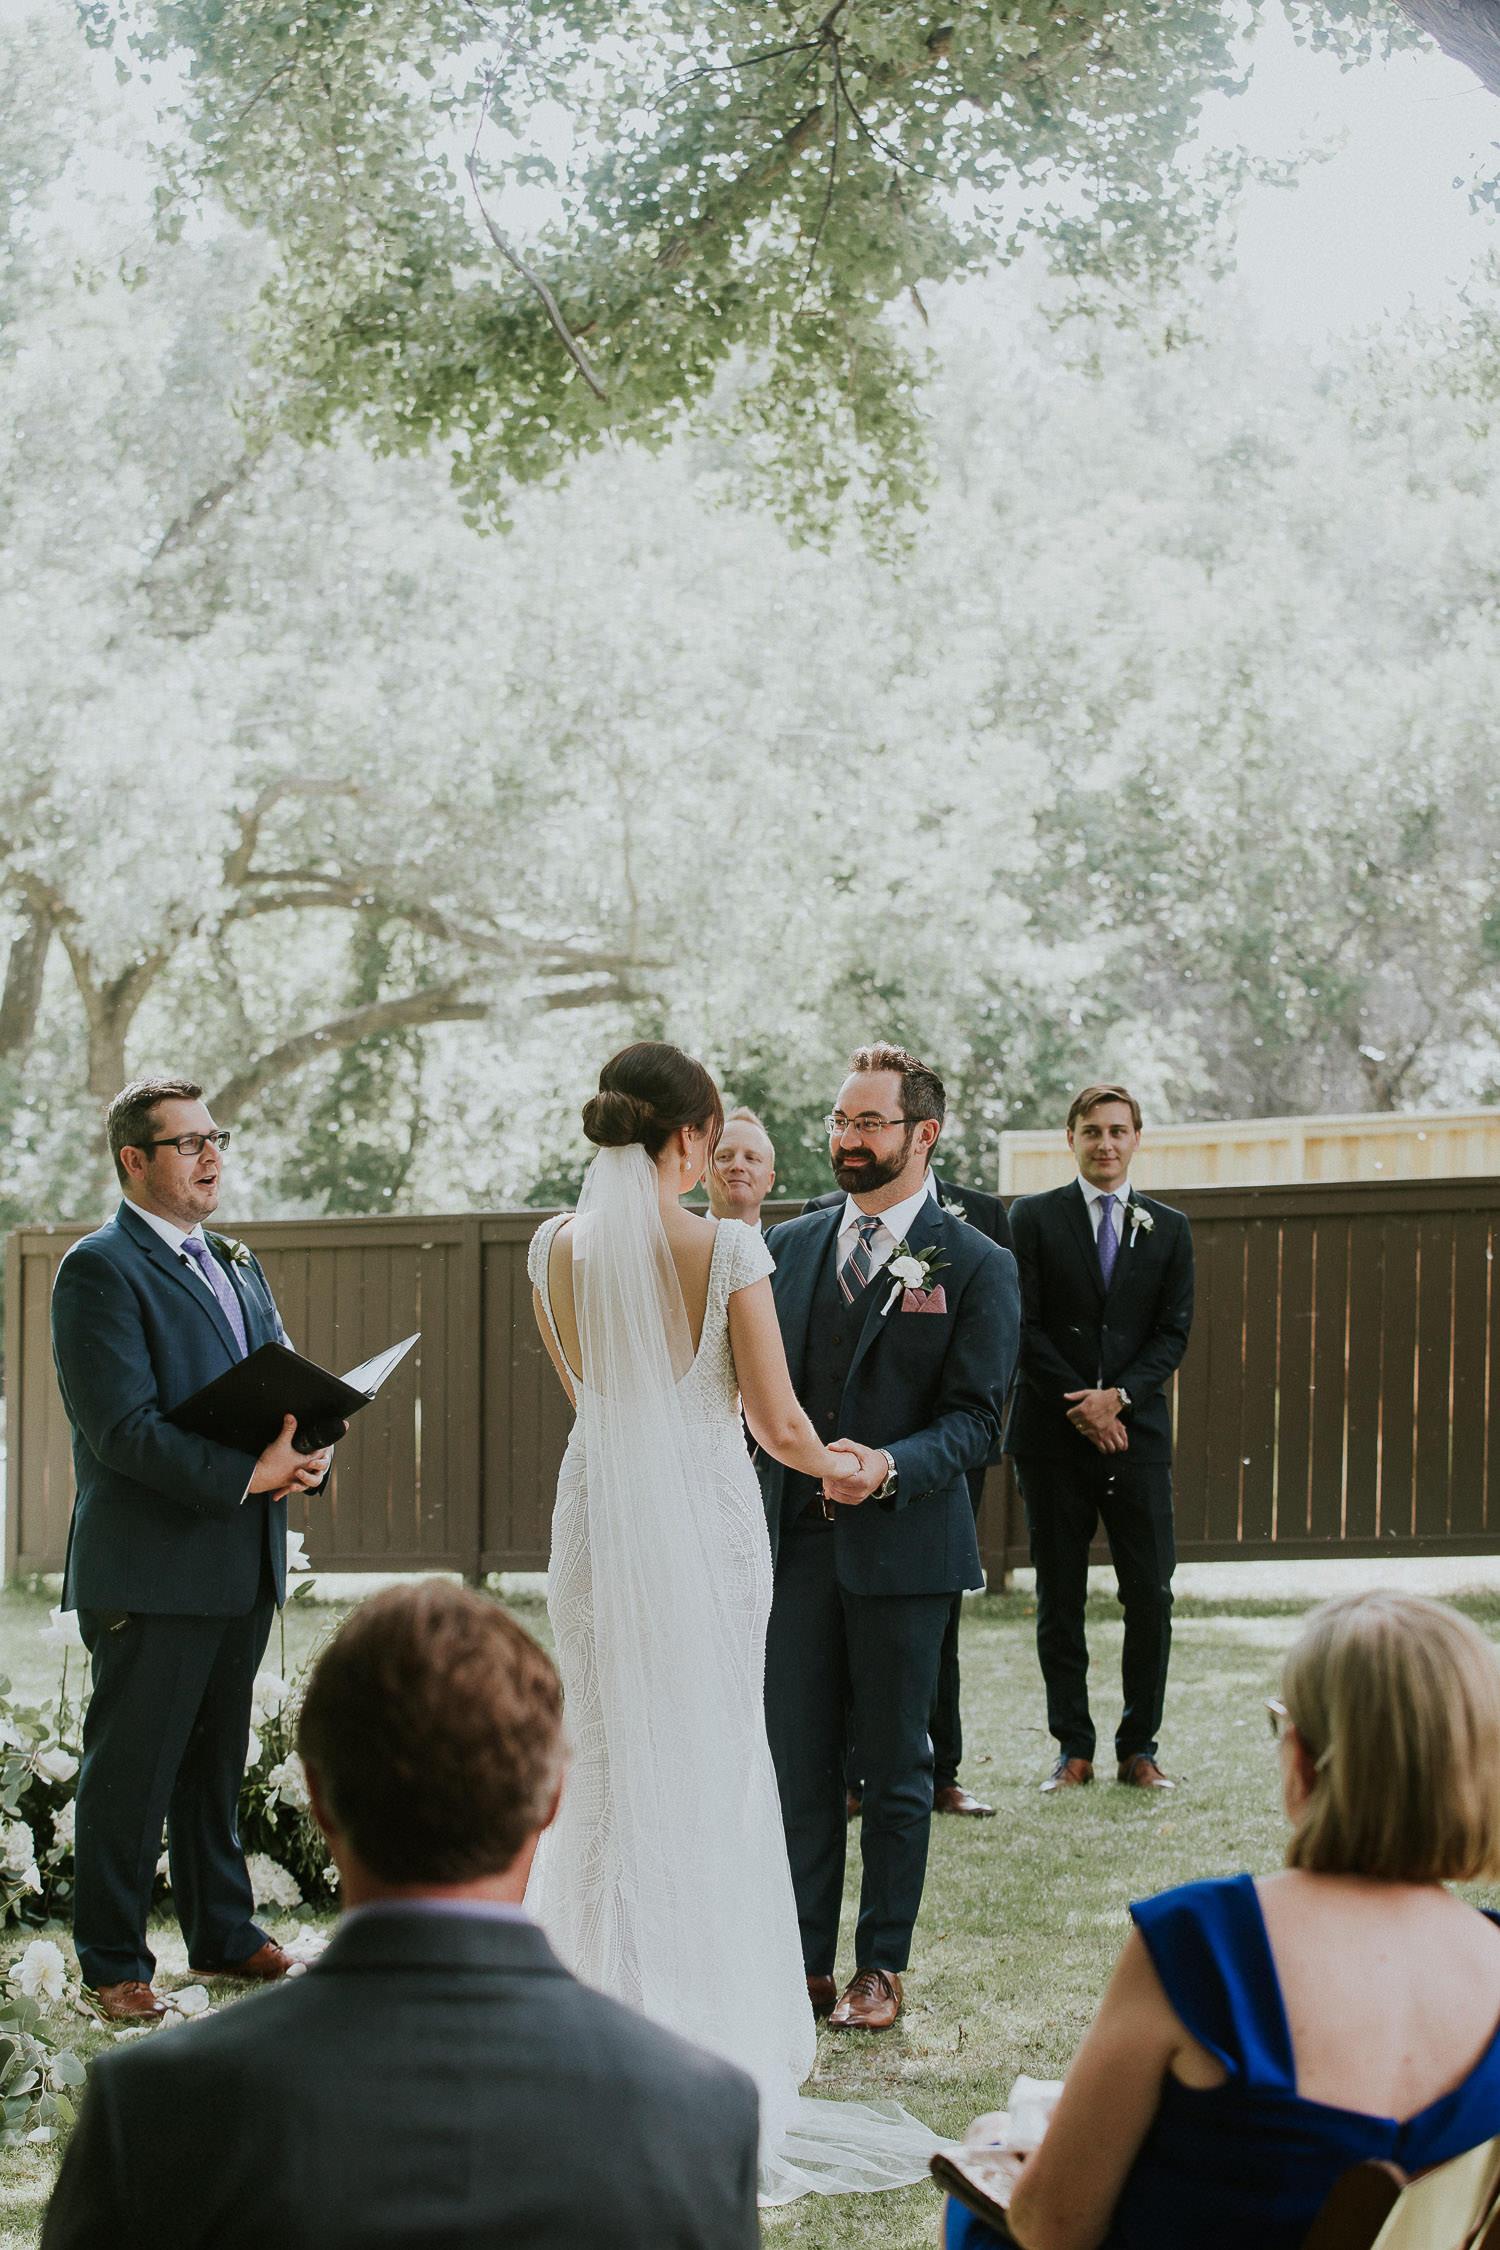 summer-backyard-wedding-in-alberta-sarah-pukin-0088